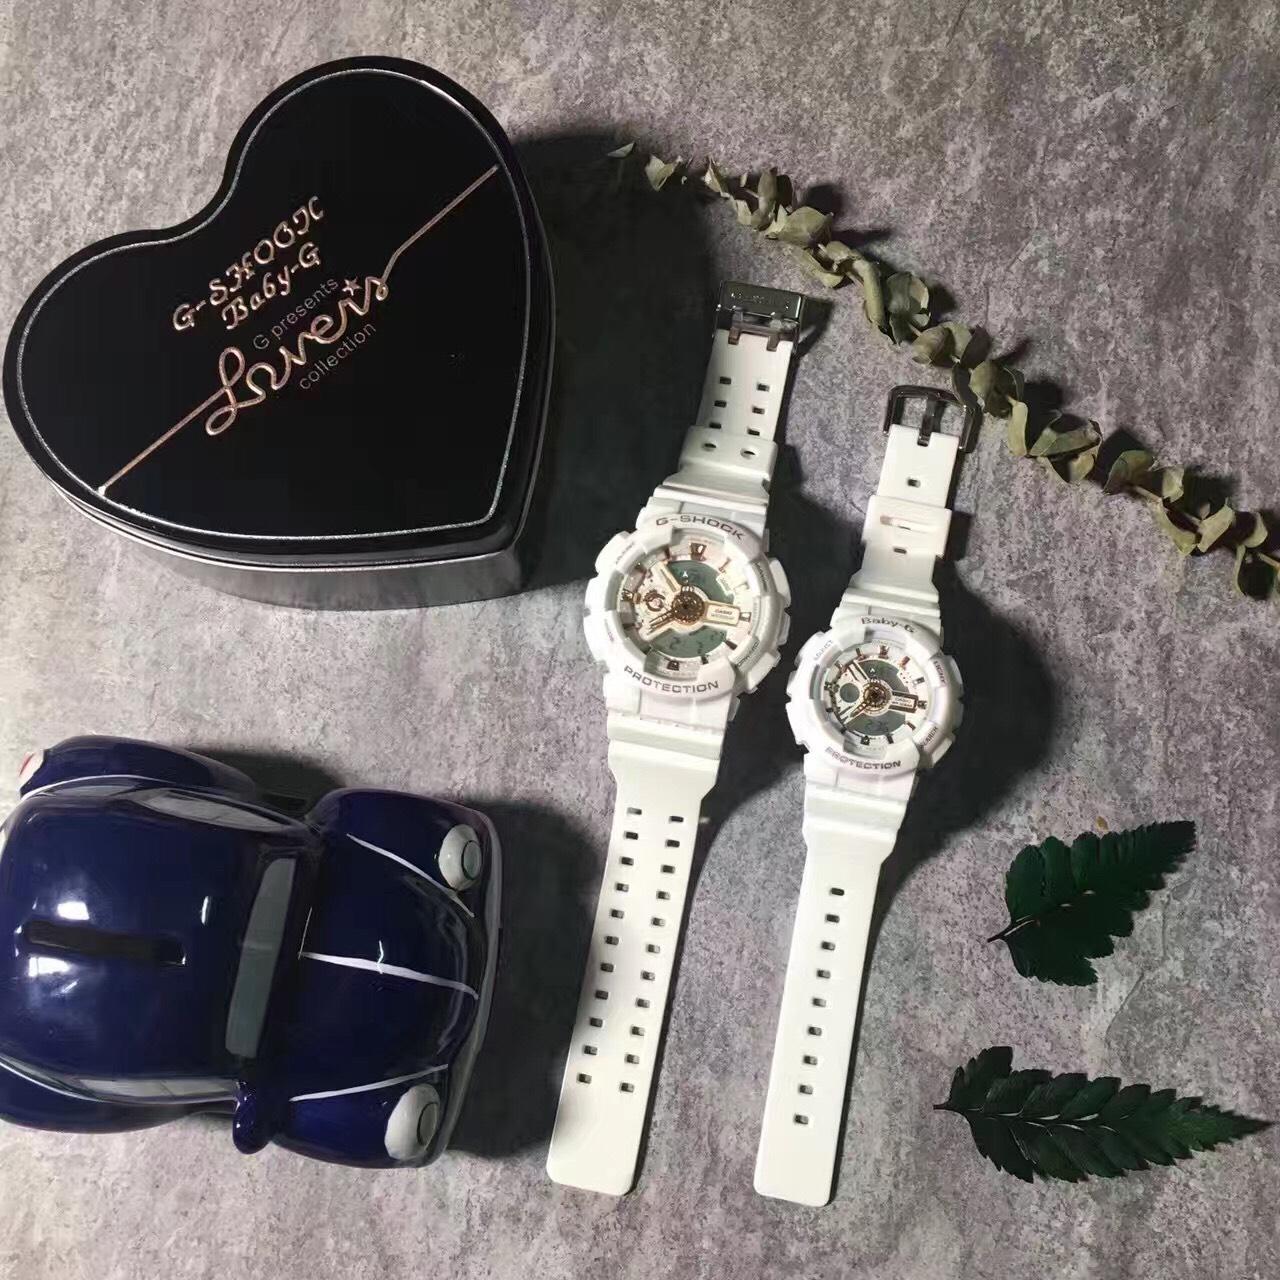 國外代購CASIO G-SHOCK GA110LB & BABY-G BA110LB7A  情侶對錶 雙顯 防水手錶